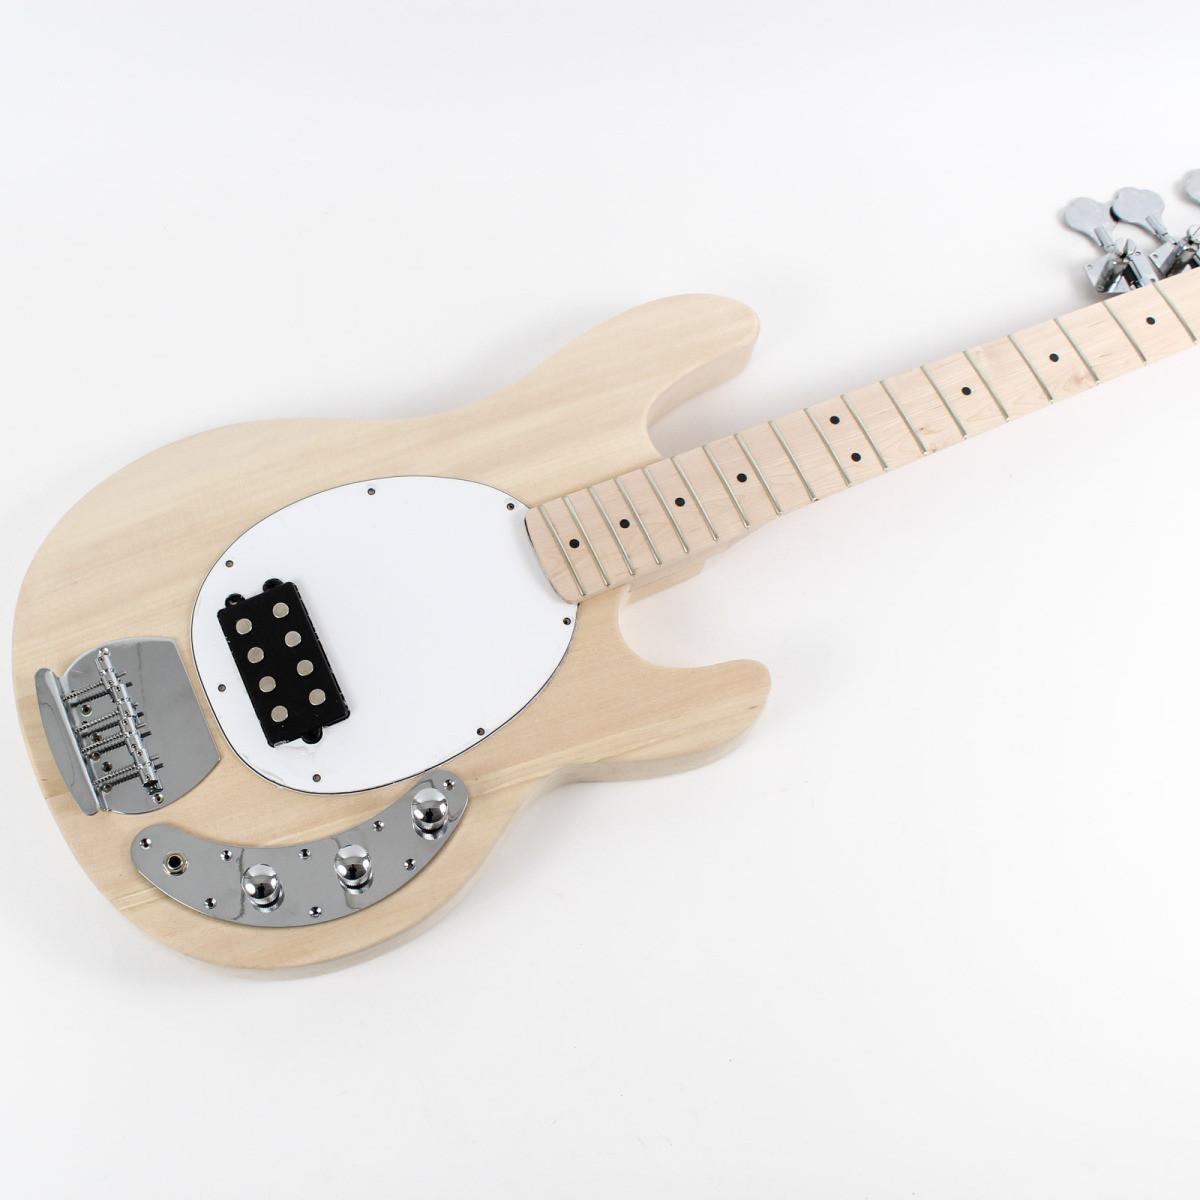 Best ideas about DIY Bass Kit . Save or Pin Music Man StingRay Bass Guitar Kit DIY Guitars Now.